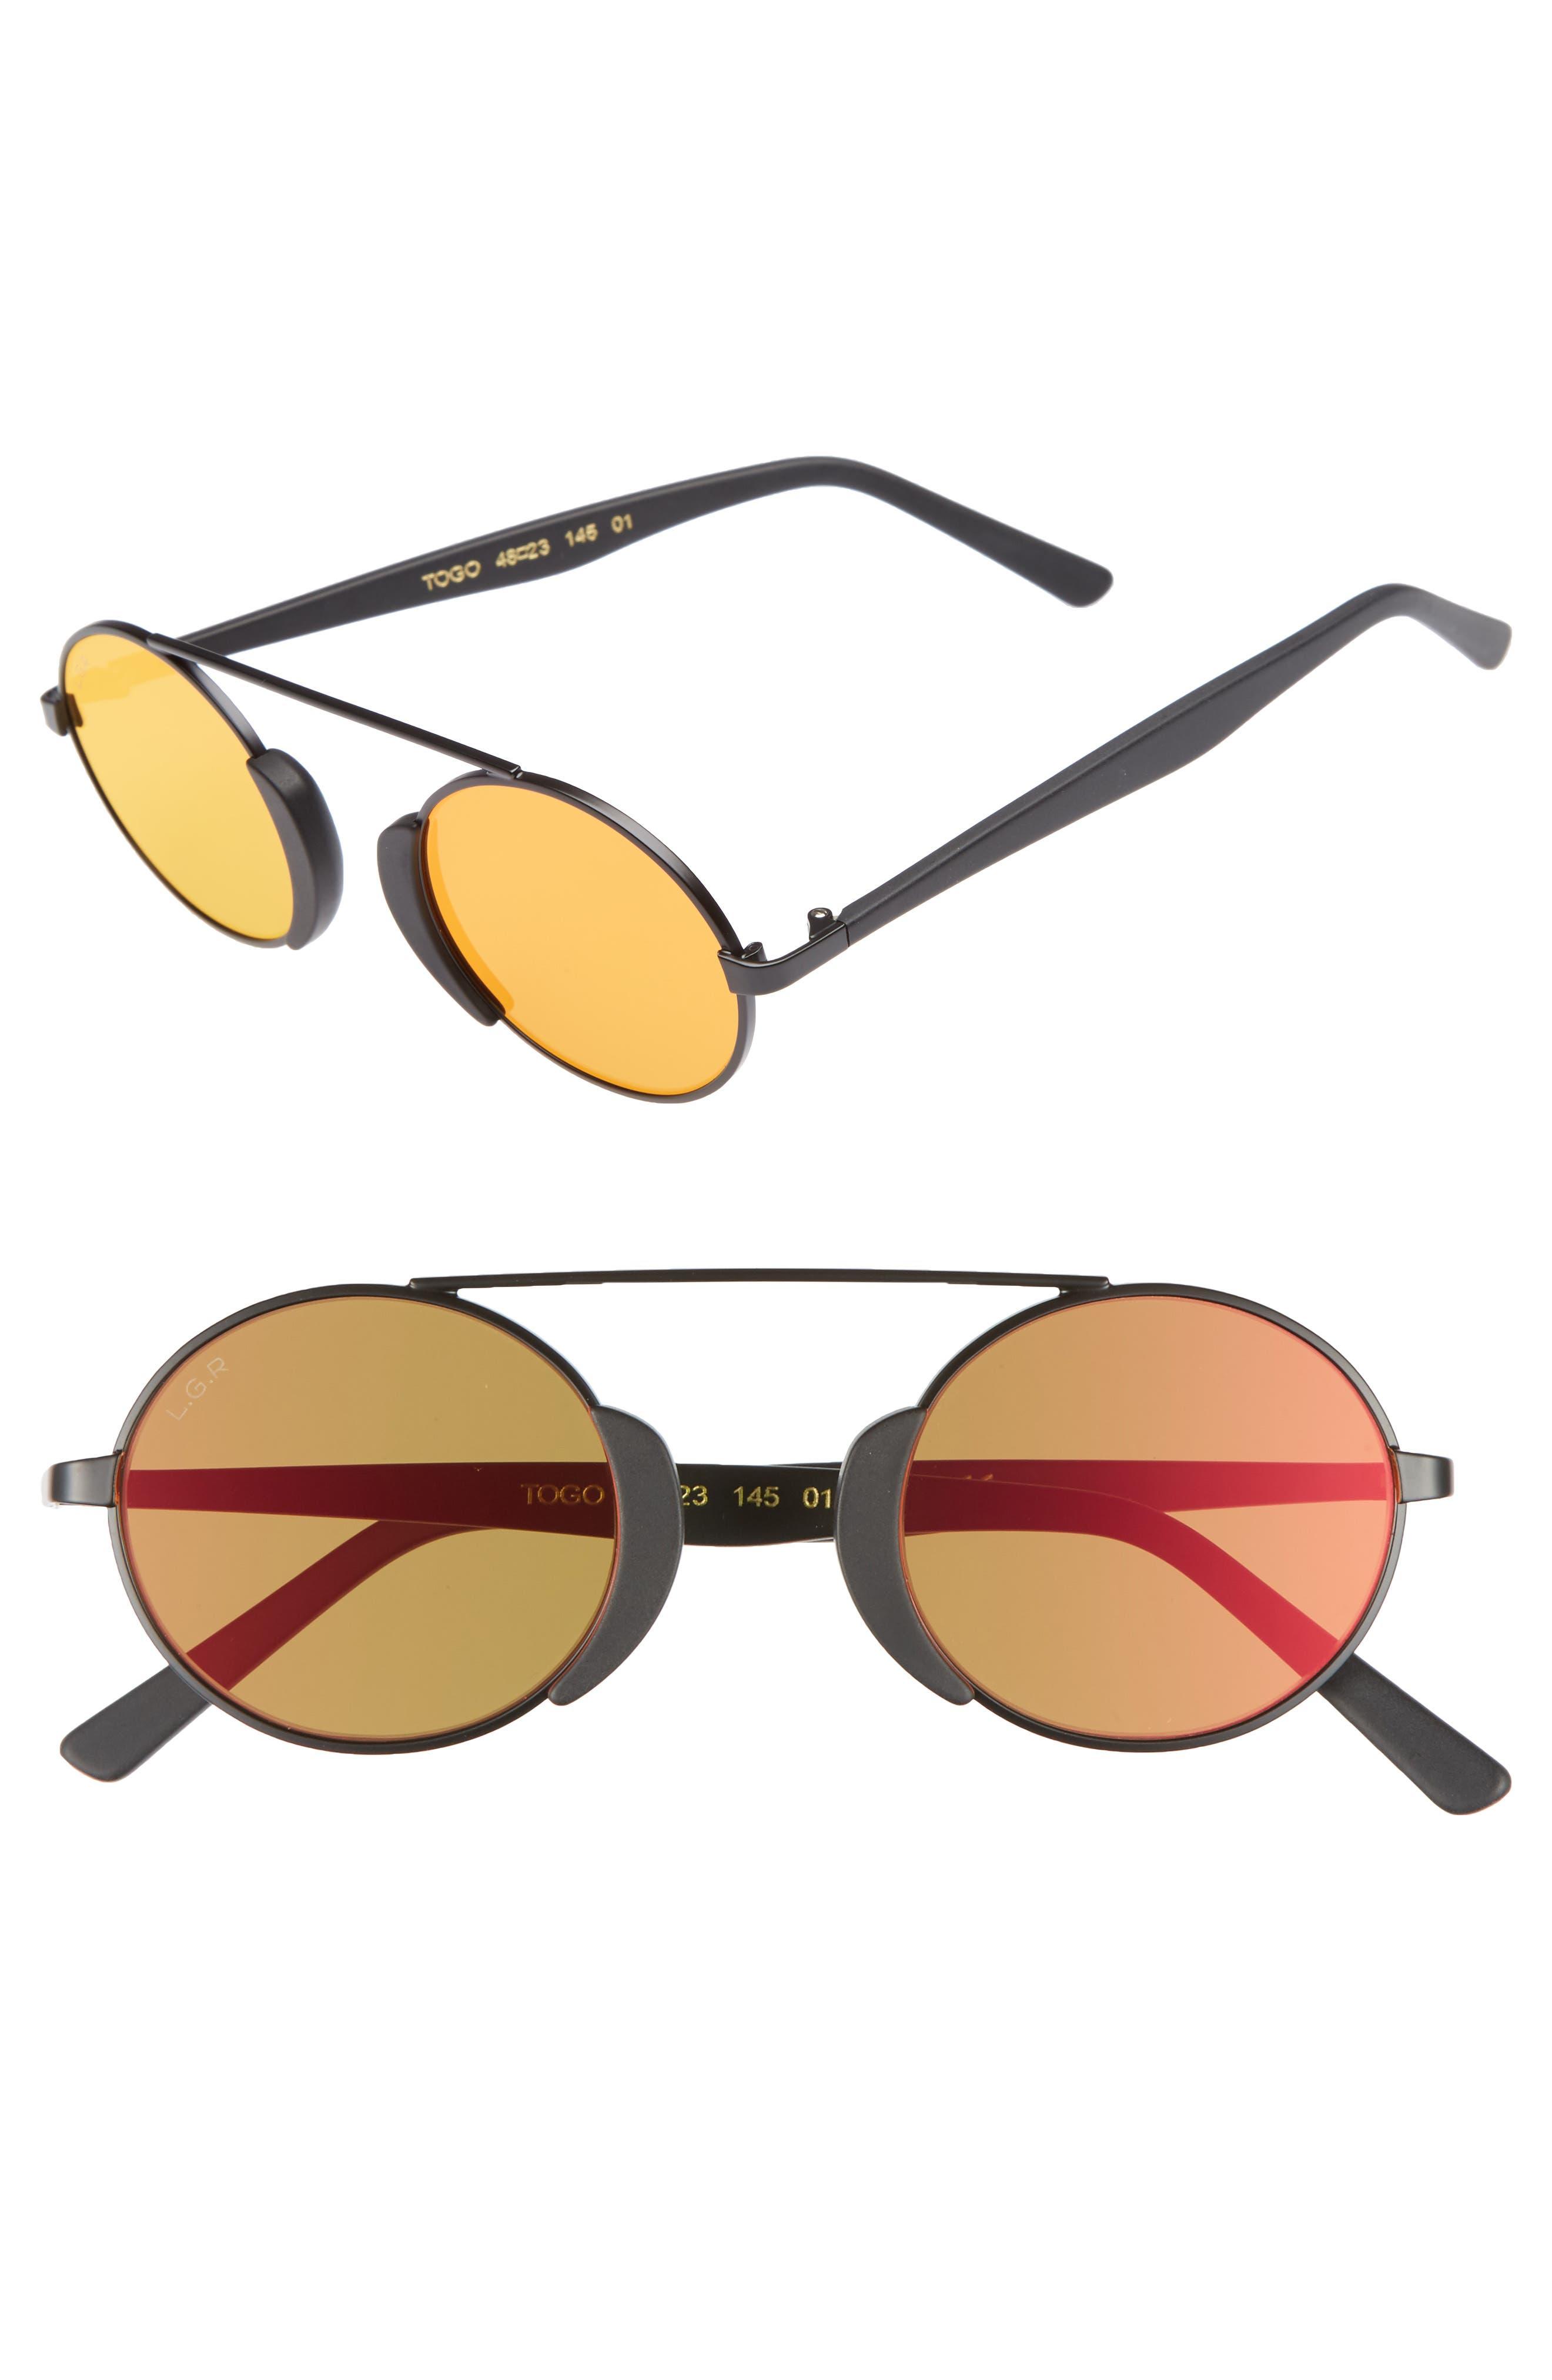 Main Image - L.G.R Togo 48mm Sunglasses